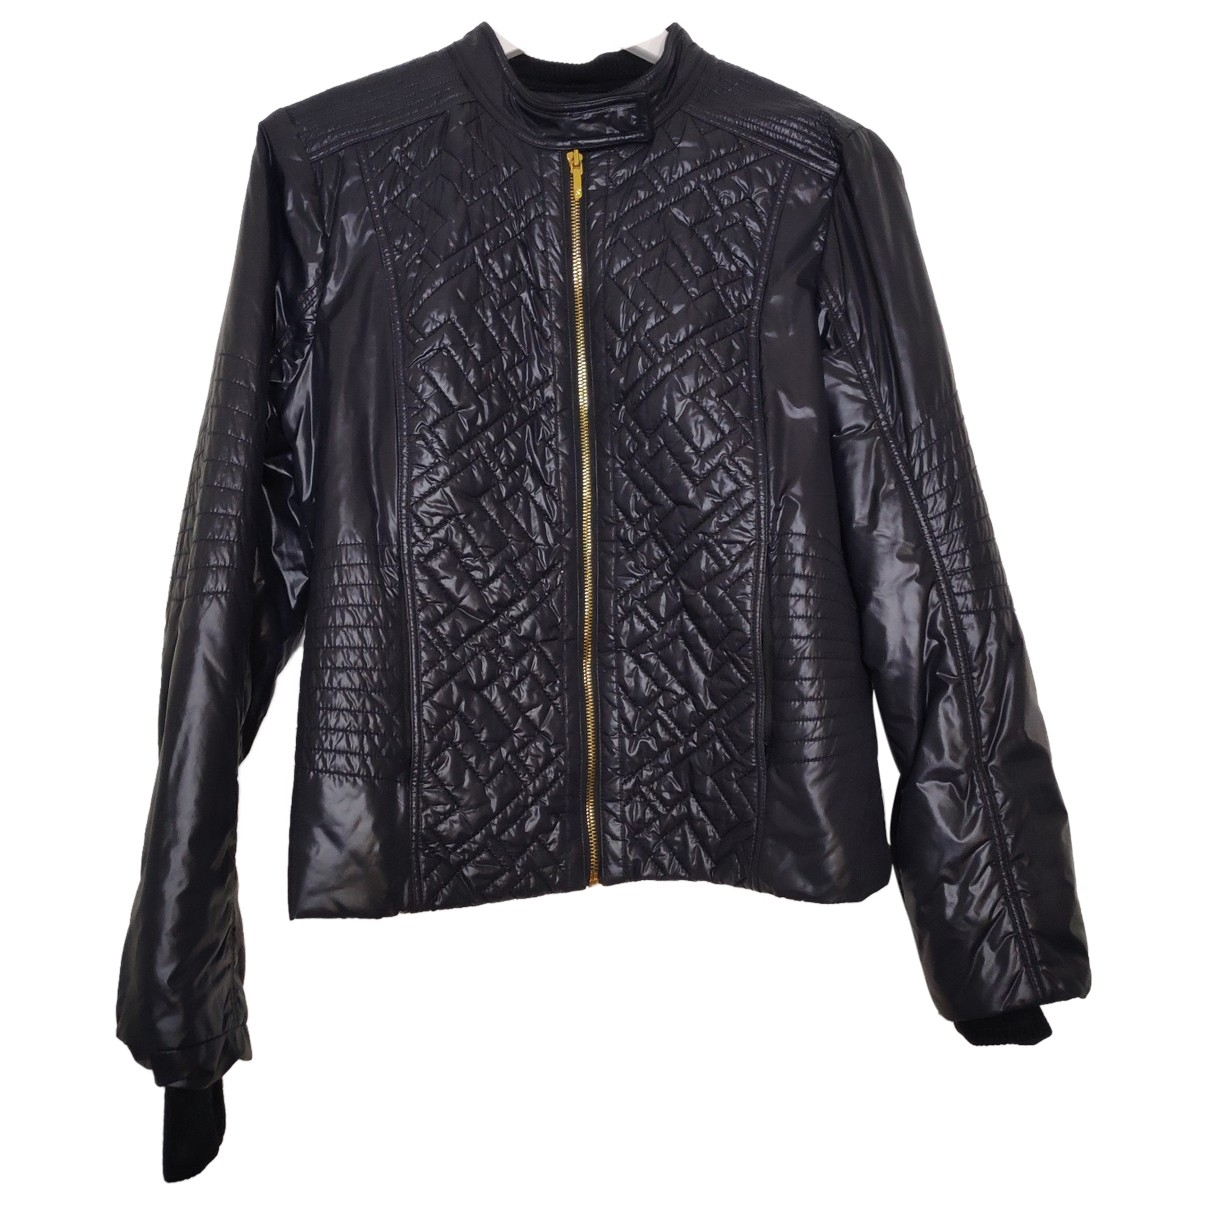 Tory Burch \N Navy jacket for Women 40 FR